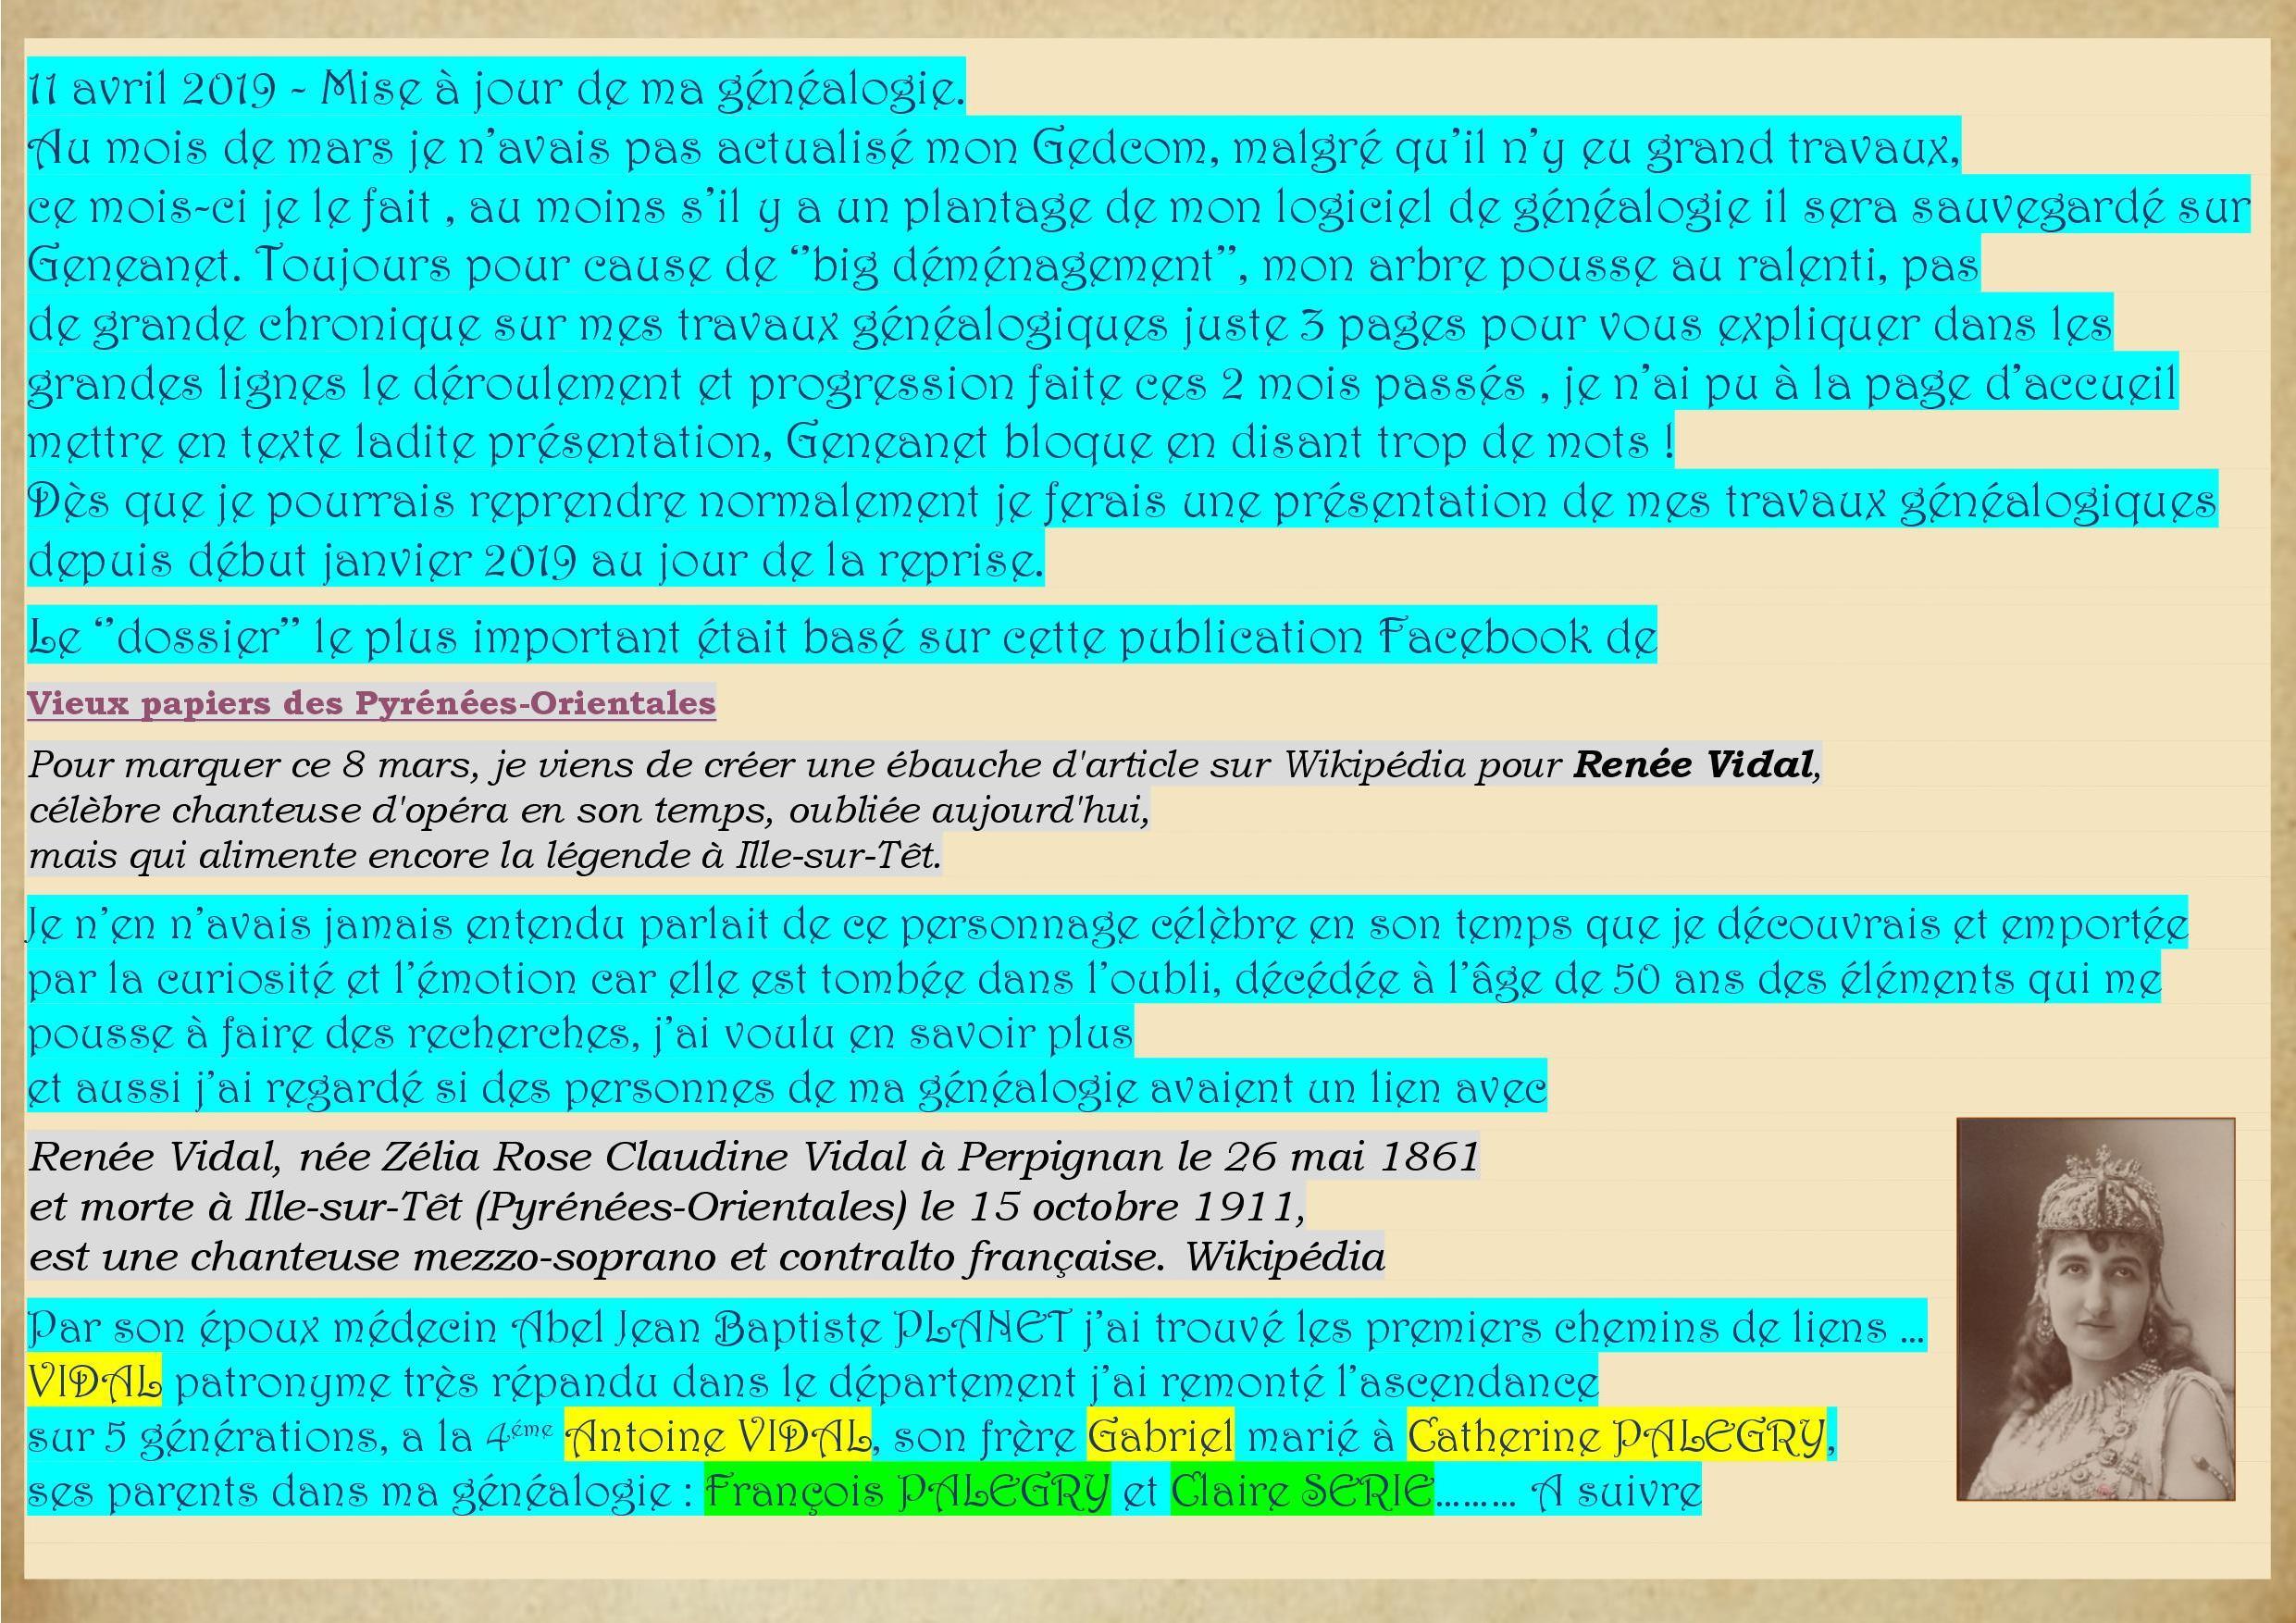 Presentation_1_mise_a_jour_de_ma_genealogie_11_avril_2019_002.jpg